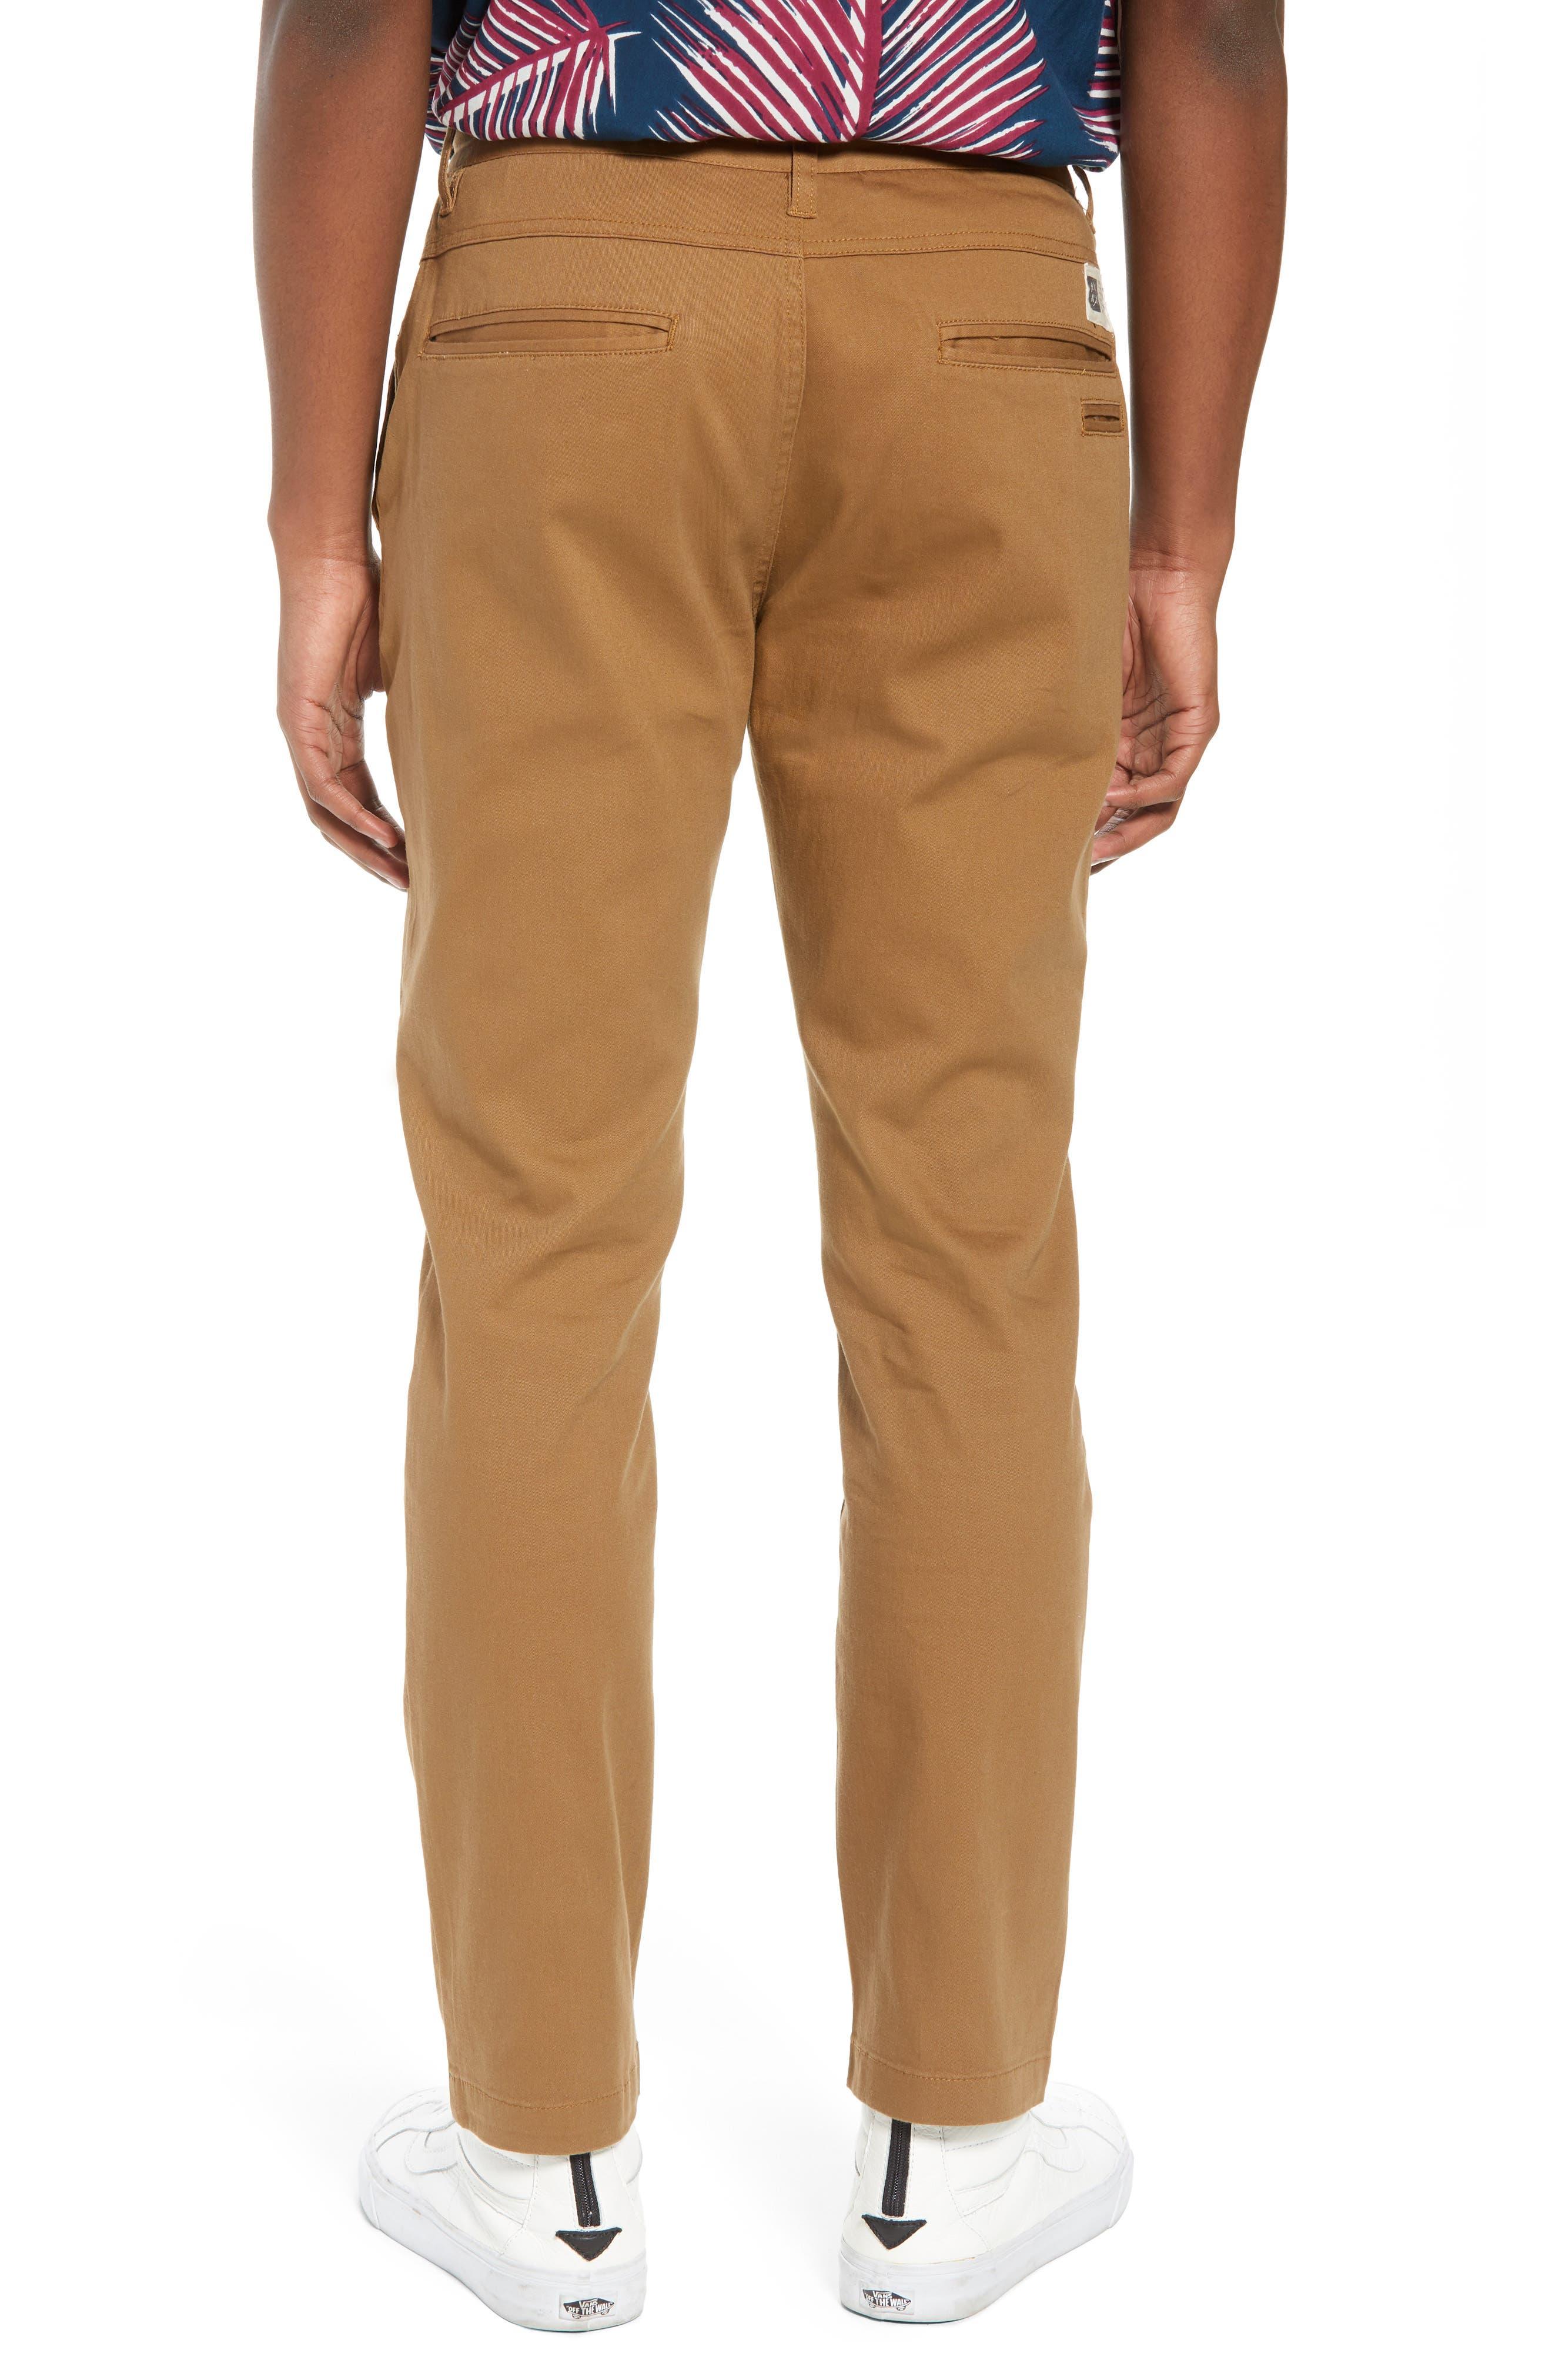 Crossroad Slim Fit Pants,                             Alternate thumbnail 2, color,                             Khaki